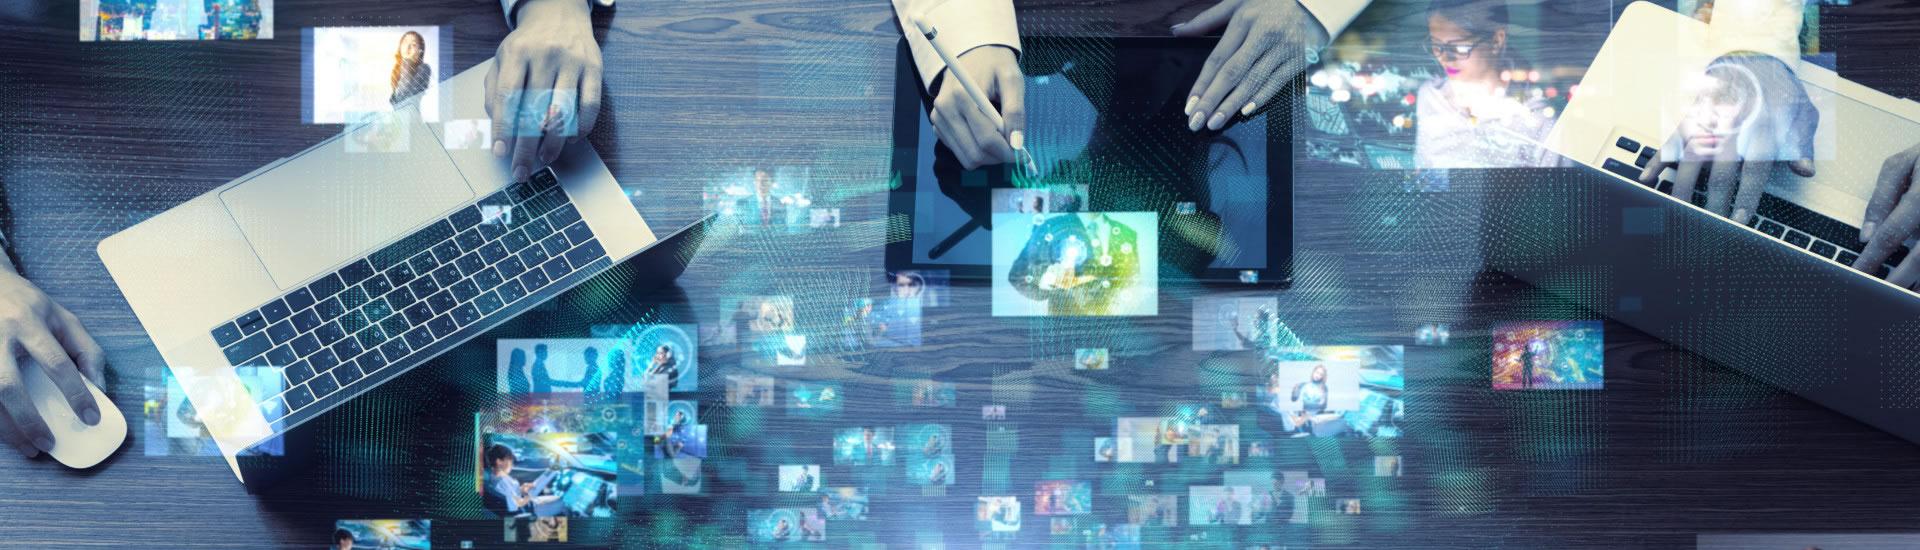 Virtual Desktop Solutions - Birmingham - Tek-nology Solutions